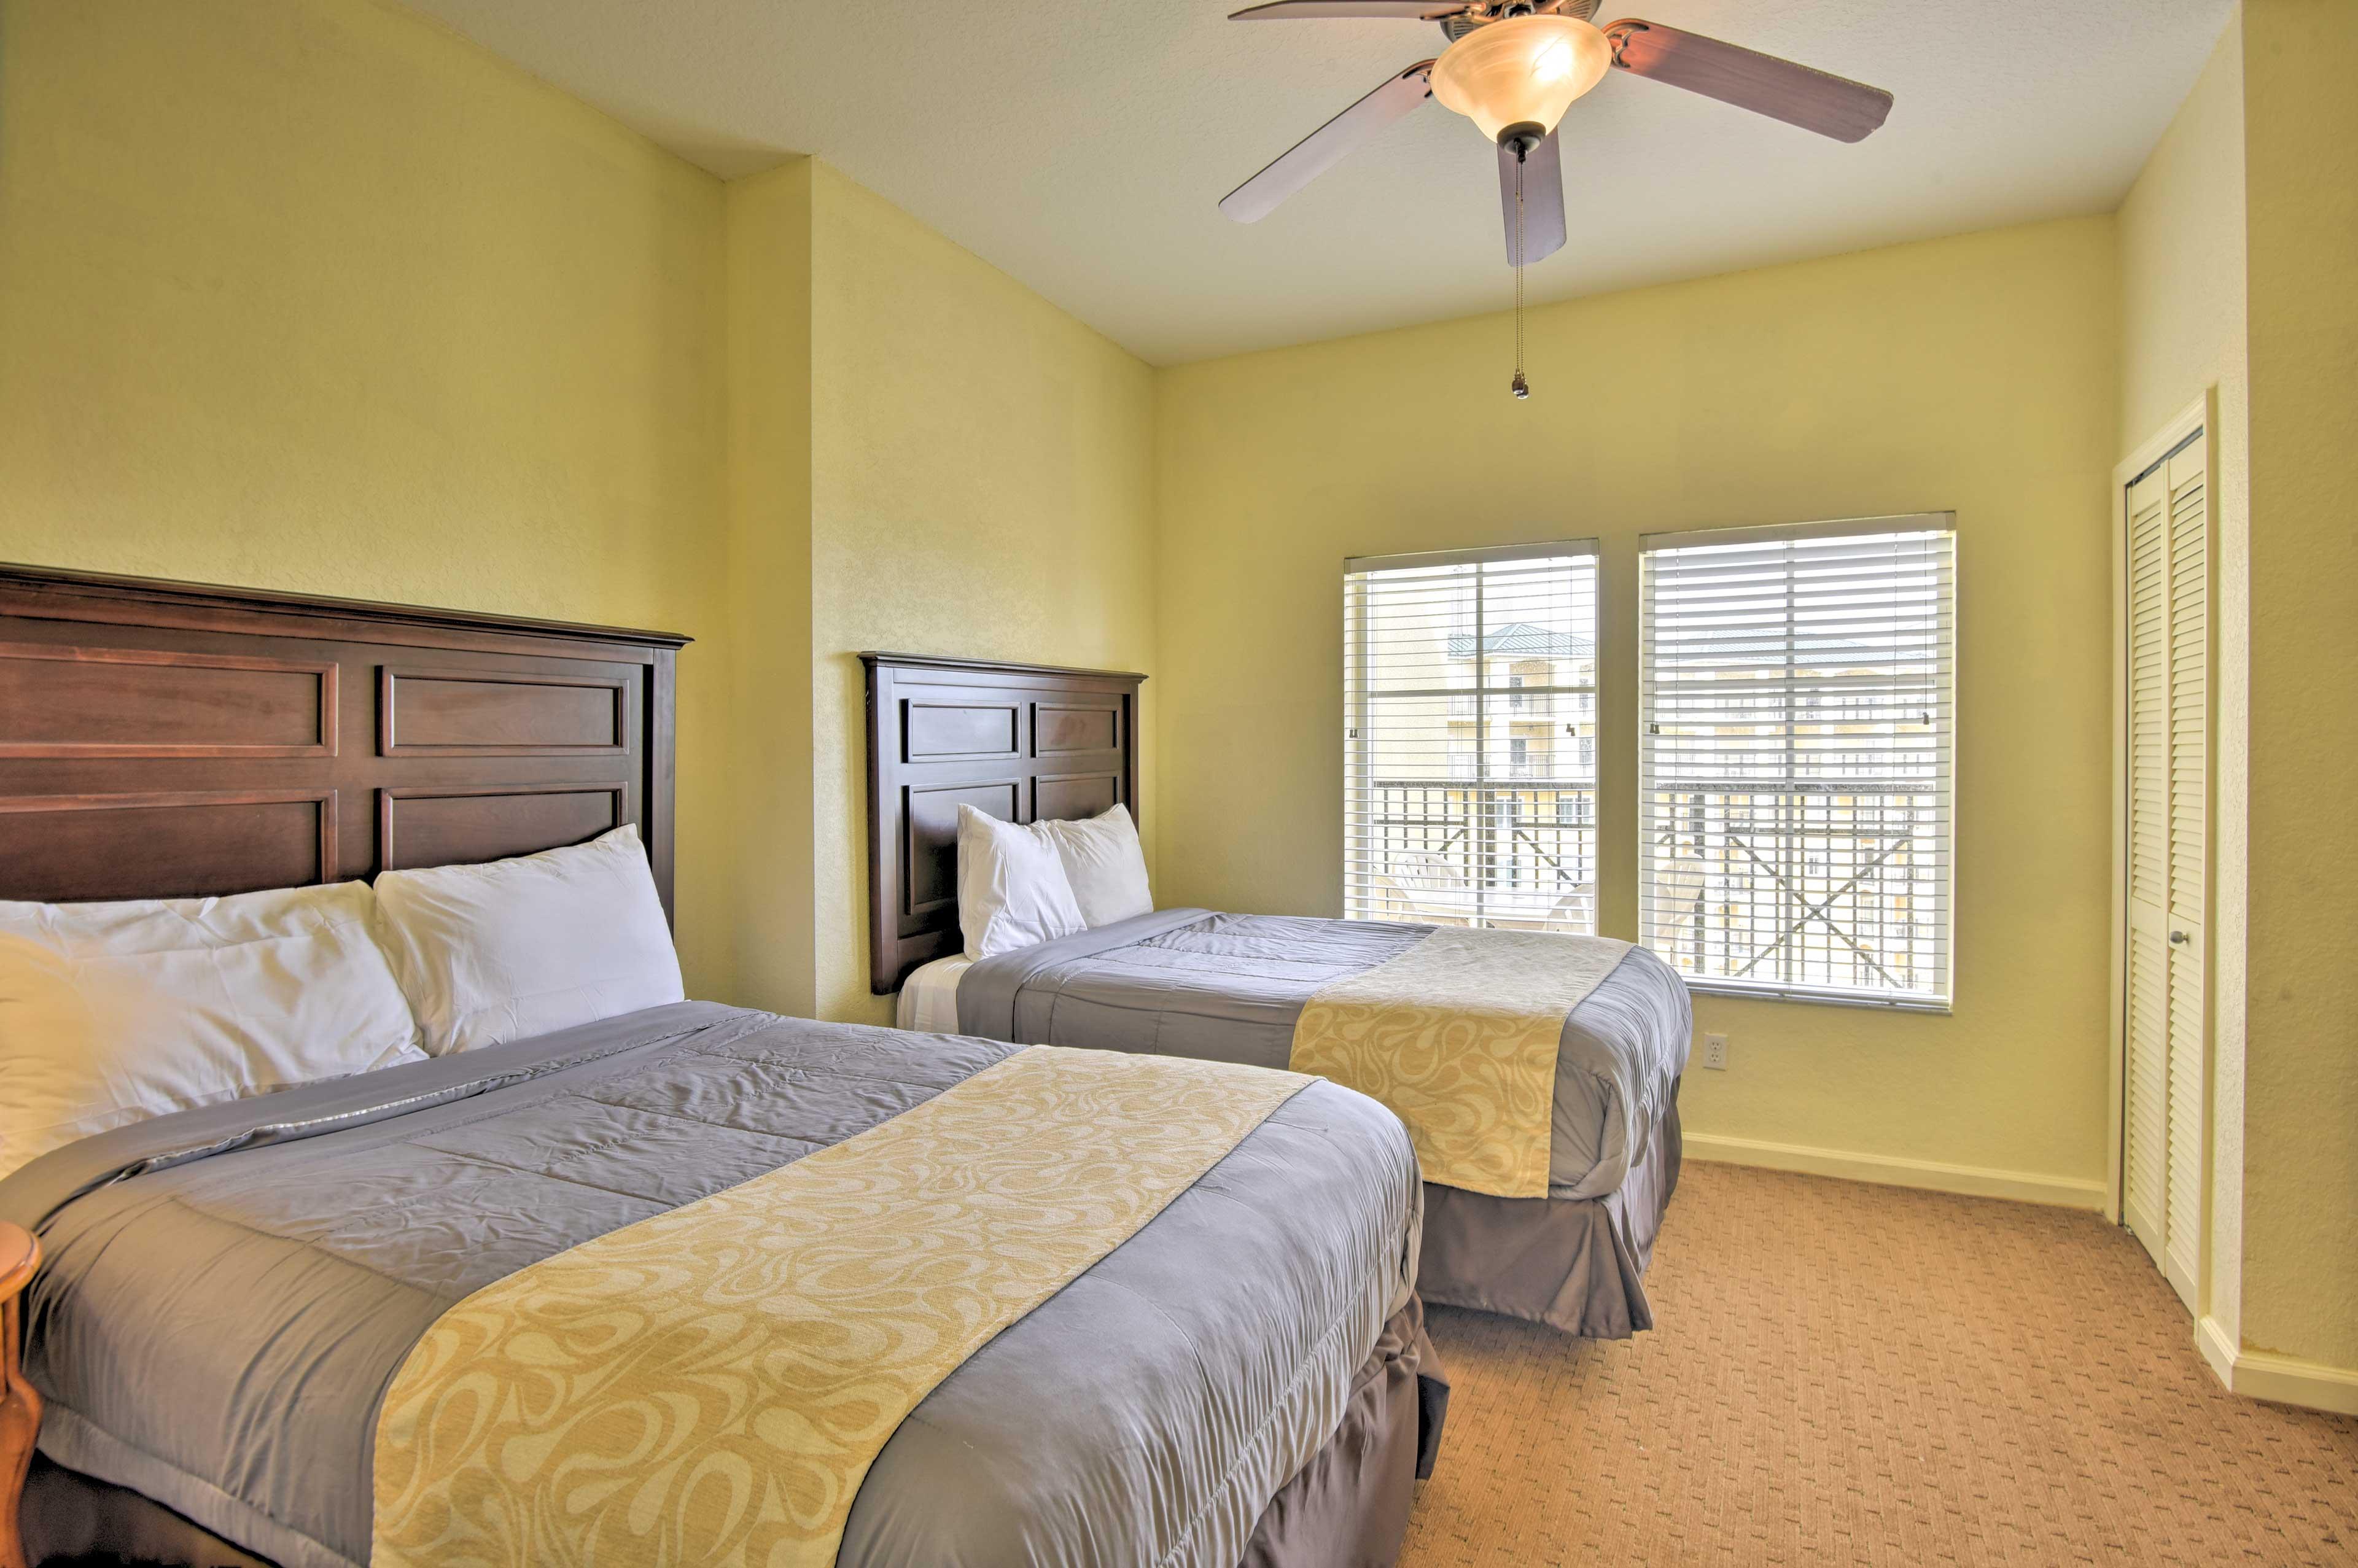 Bedroom 2 boasts 2 full-sized beds.